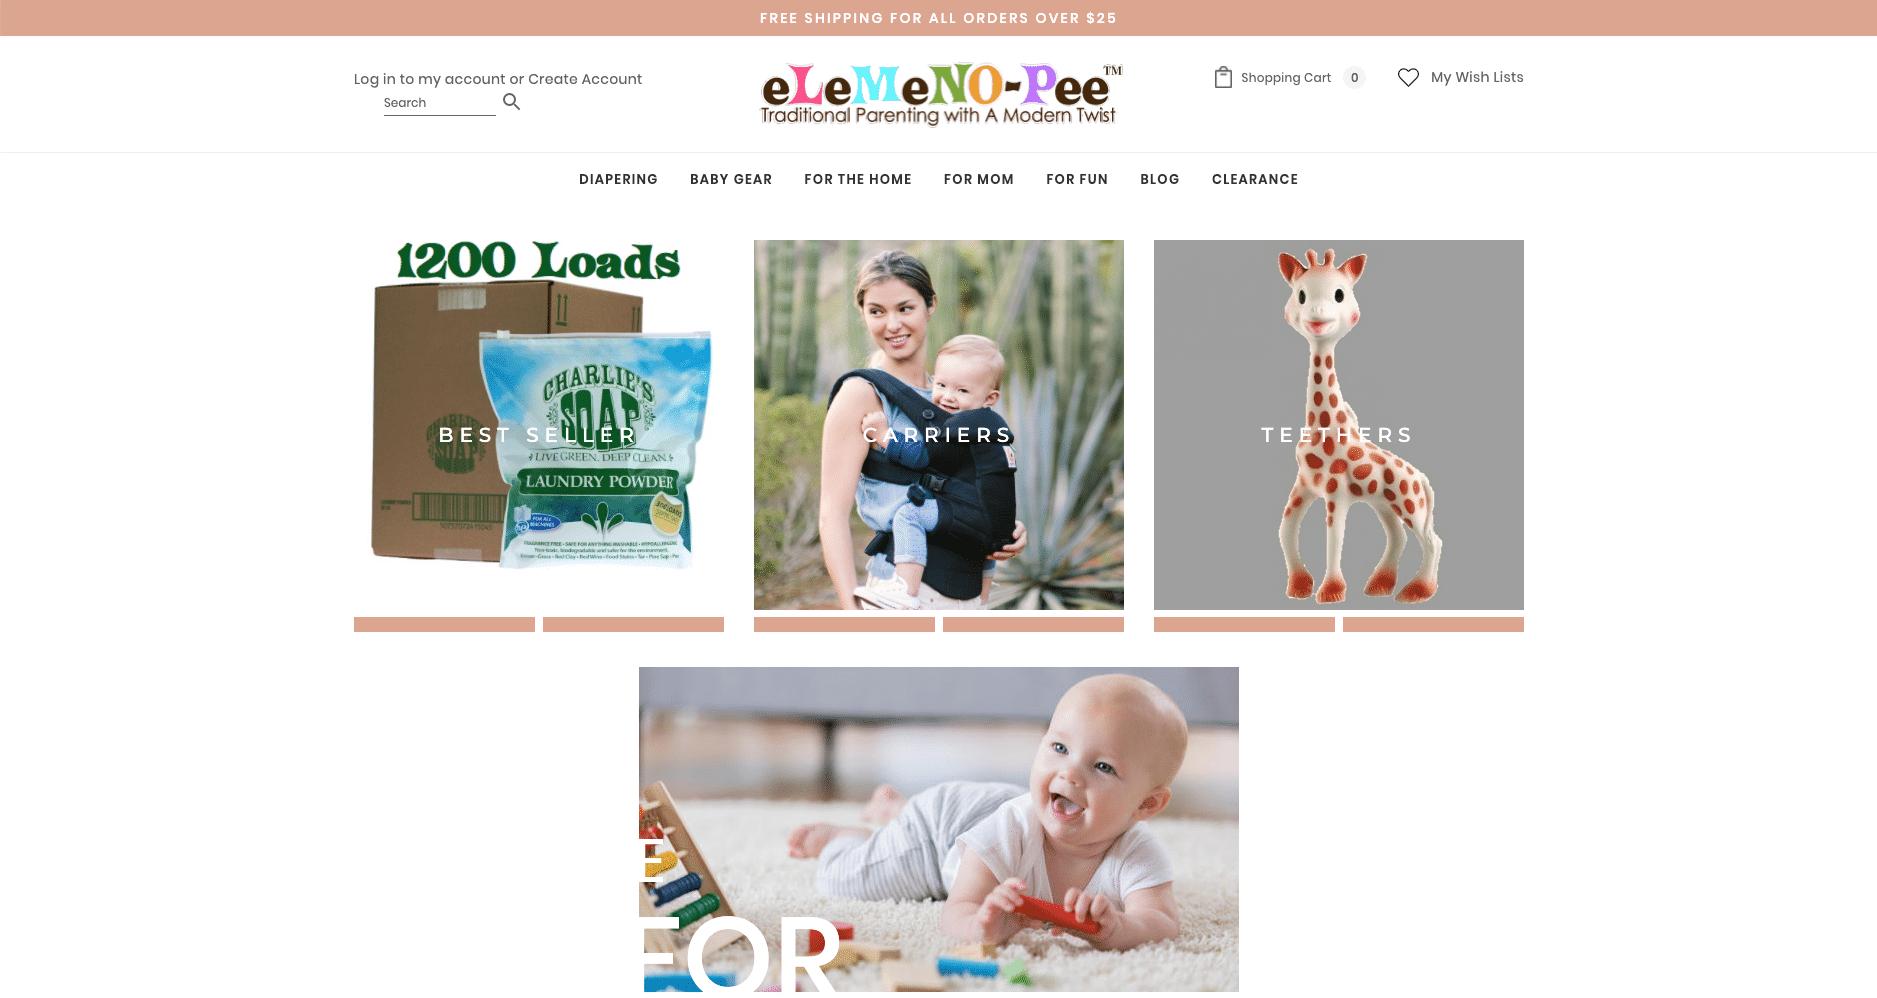 eLeMeNO-Pee, productos modernos para padres